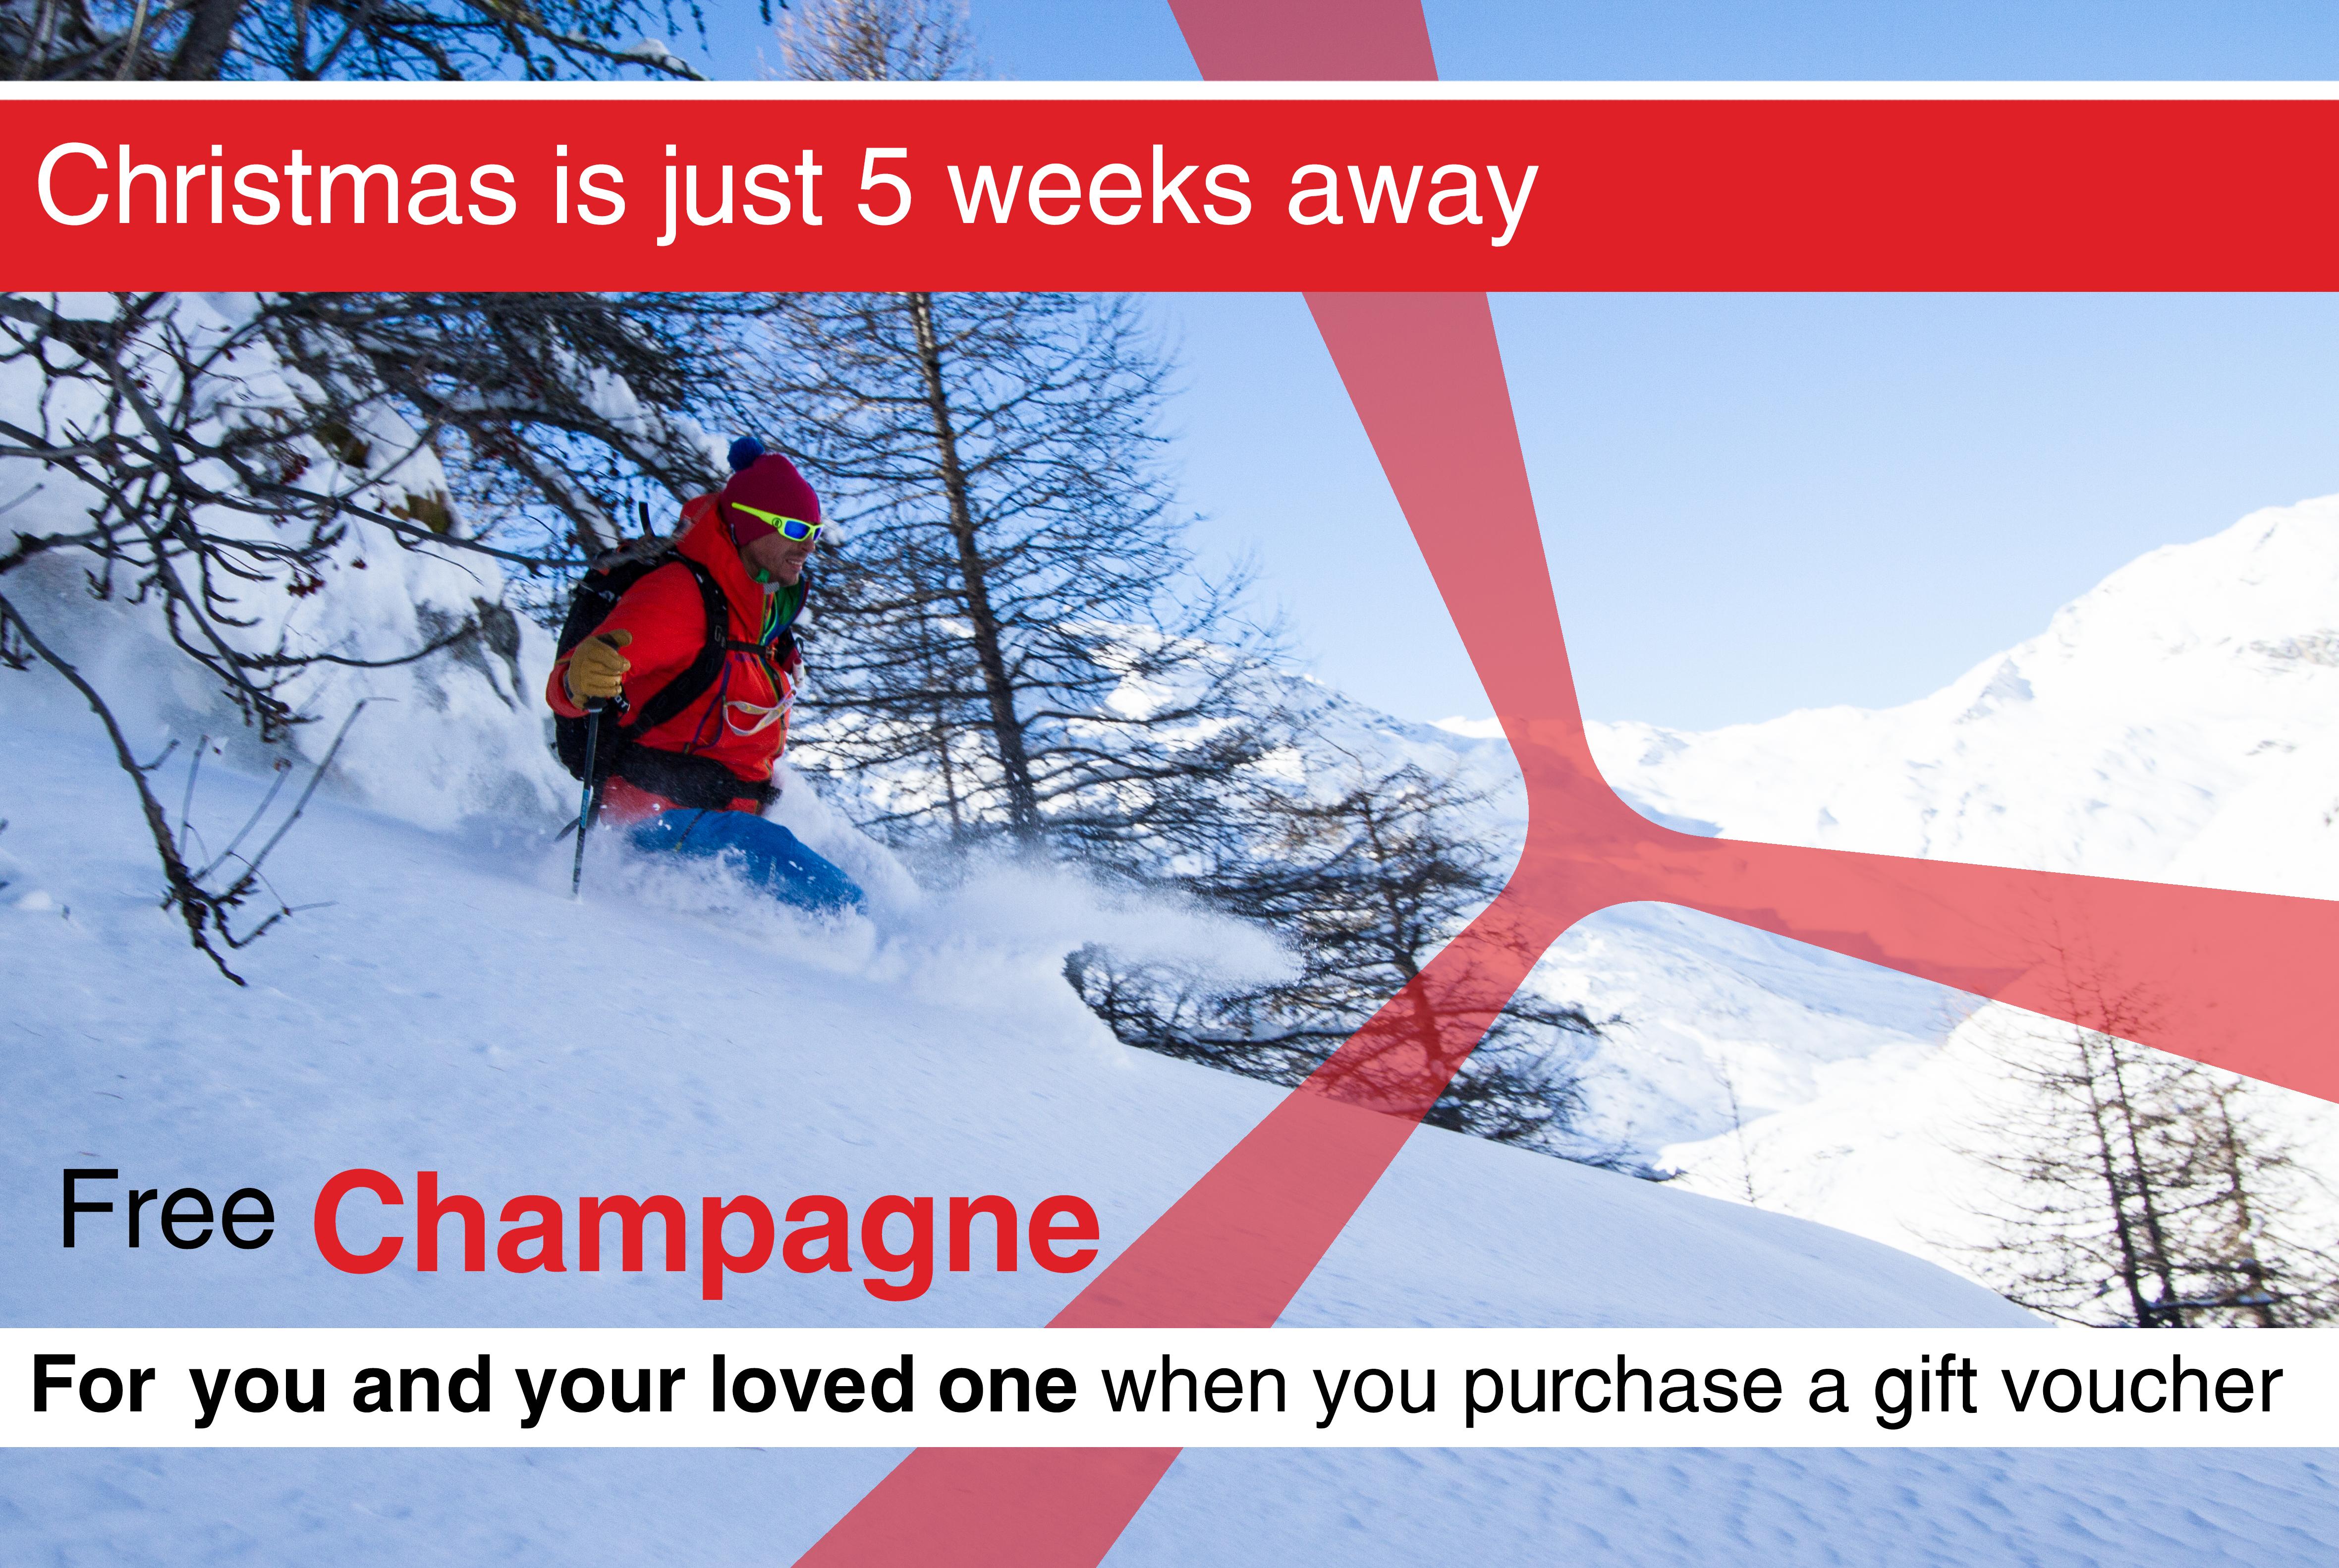 Christmas image 5 weeks